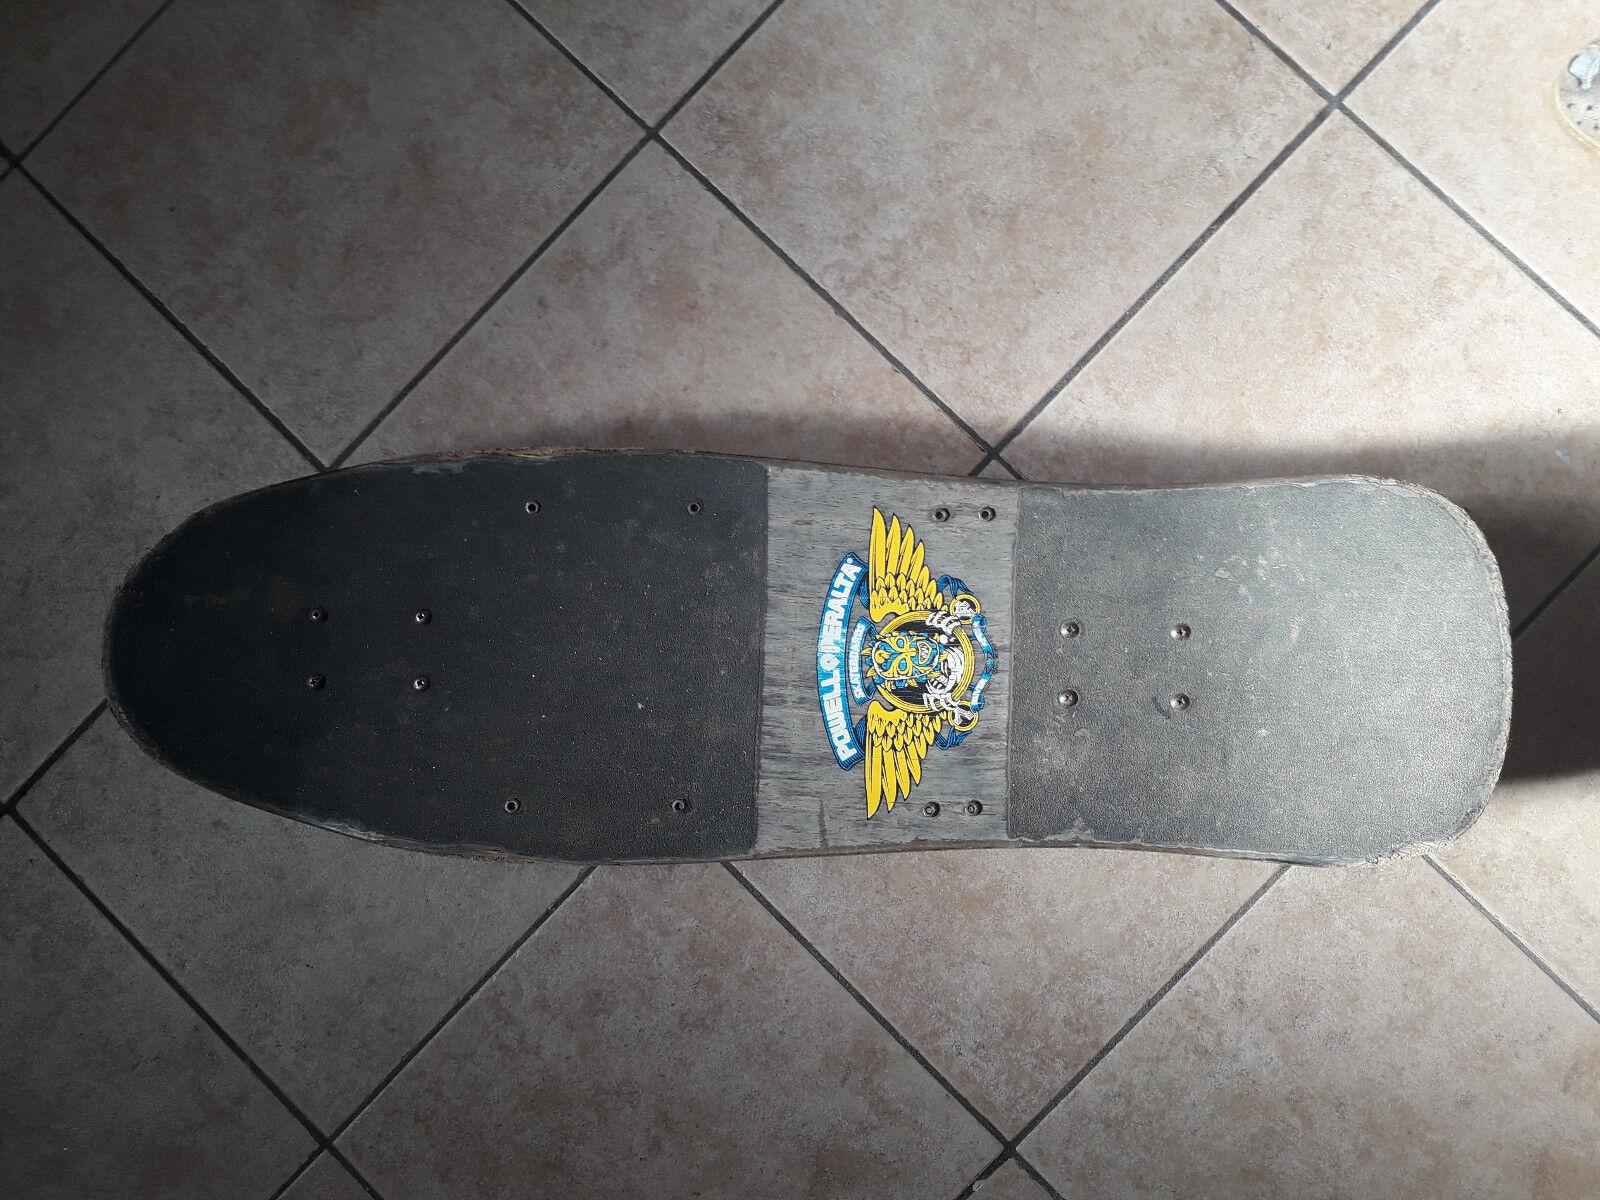 Rare skateboard used Nicky Guerrero Powell Peralta trucks gullwing year 1980 90